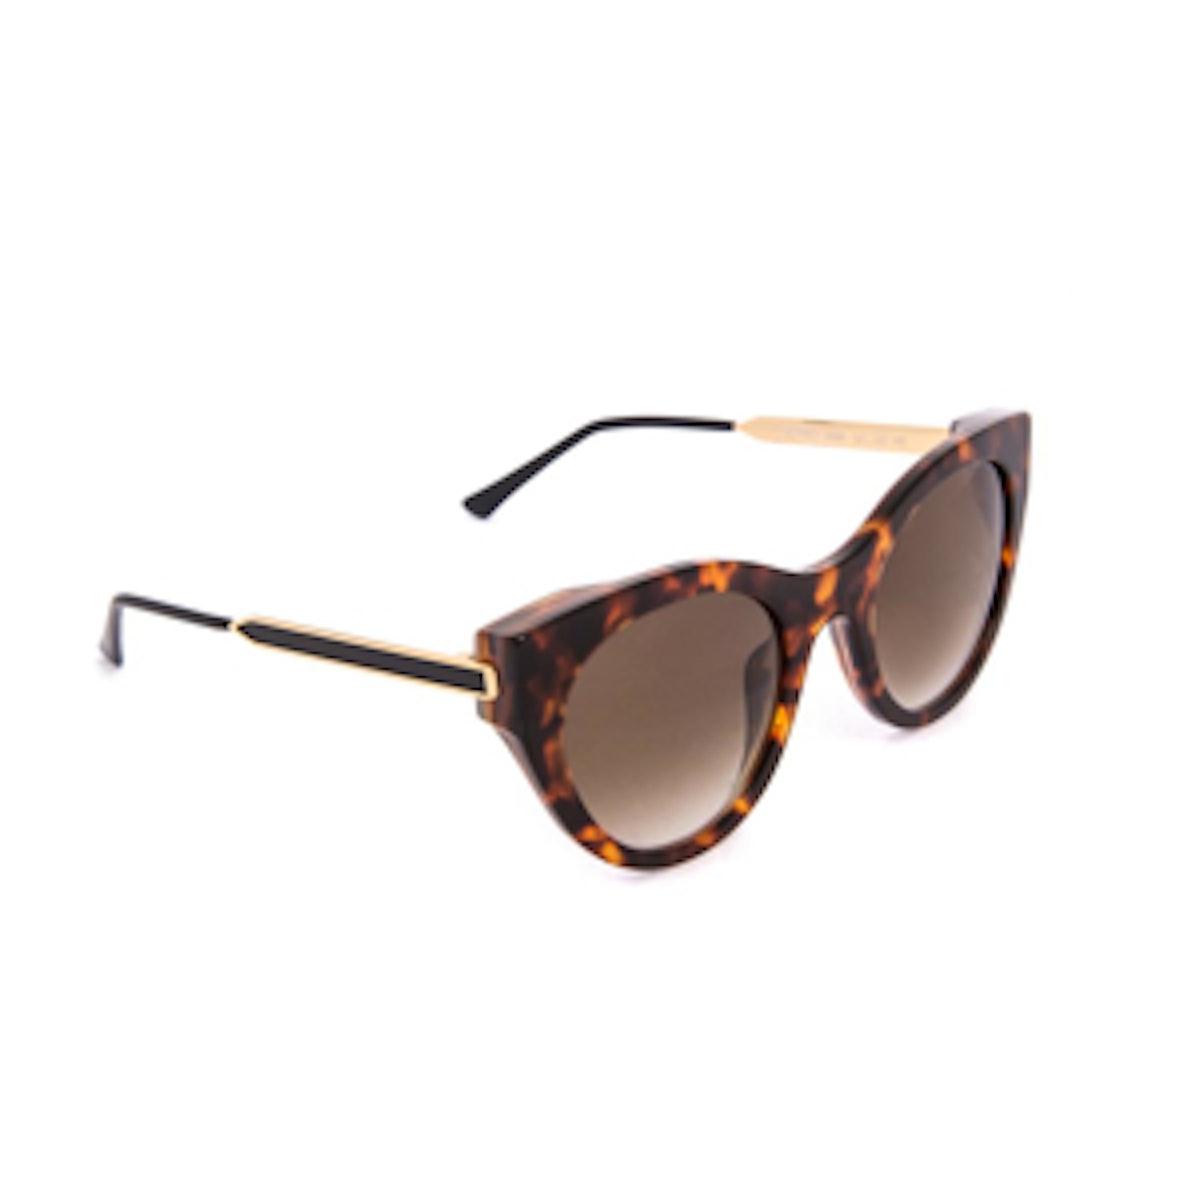 Joyride Sunglasses